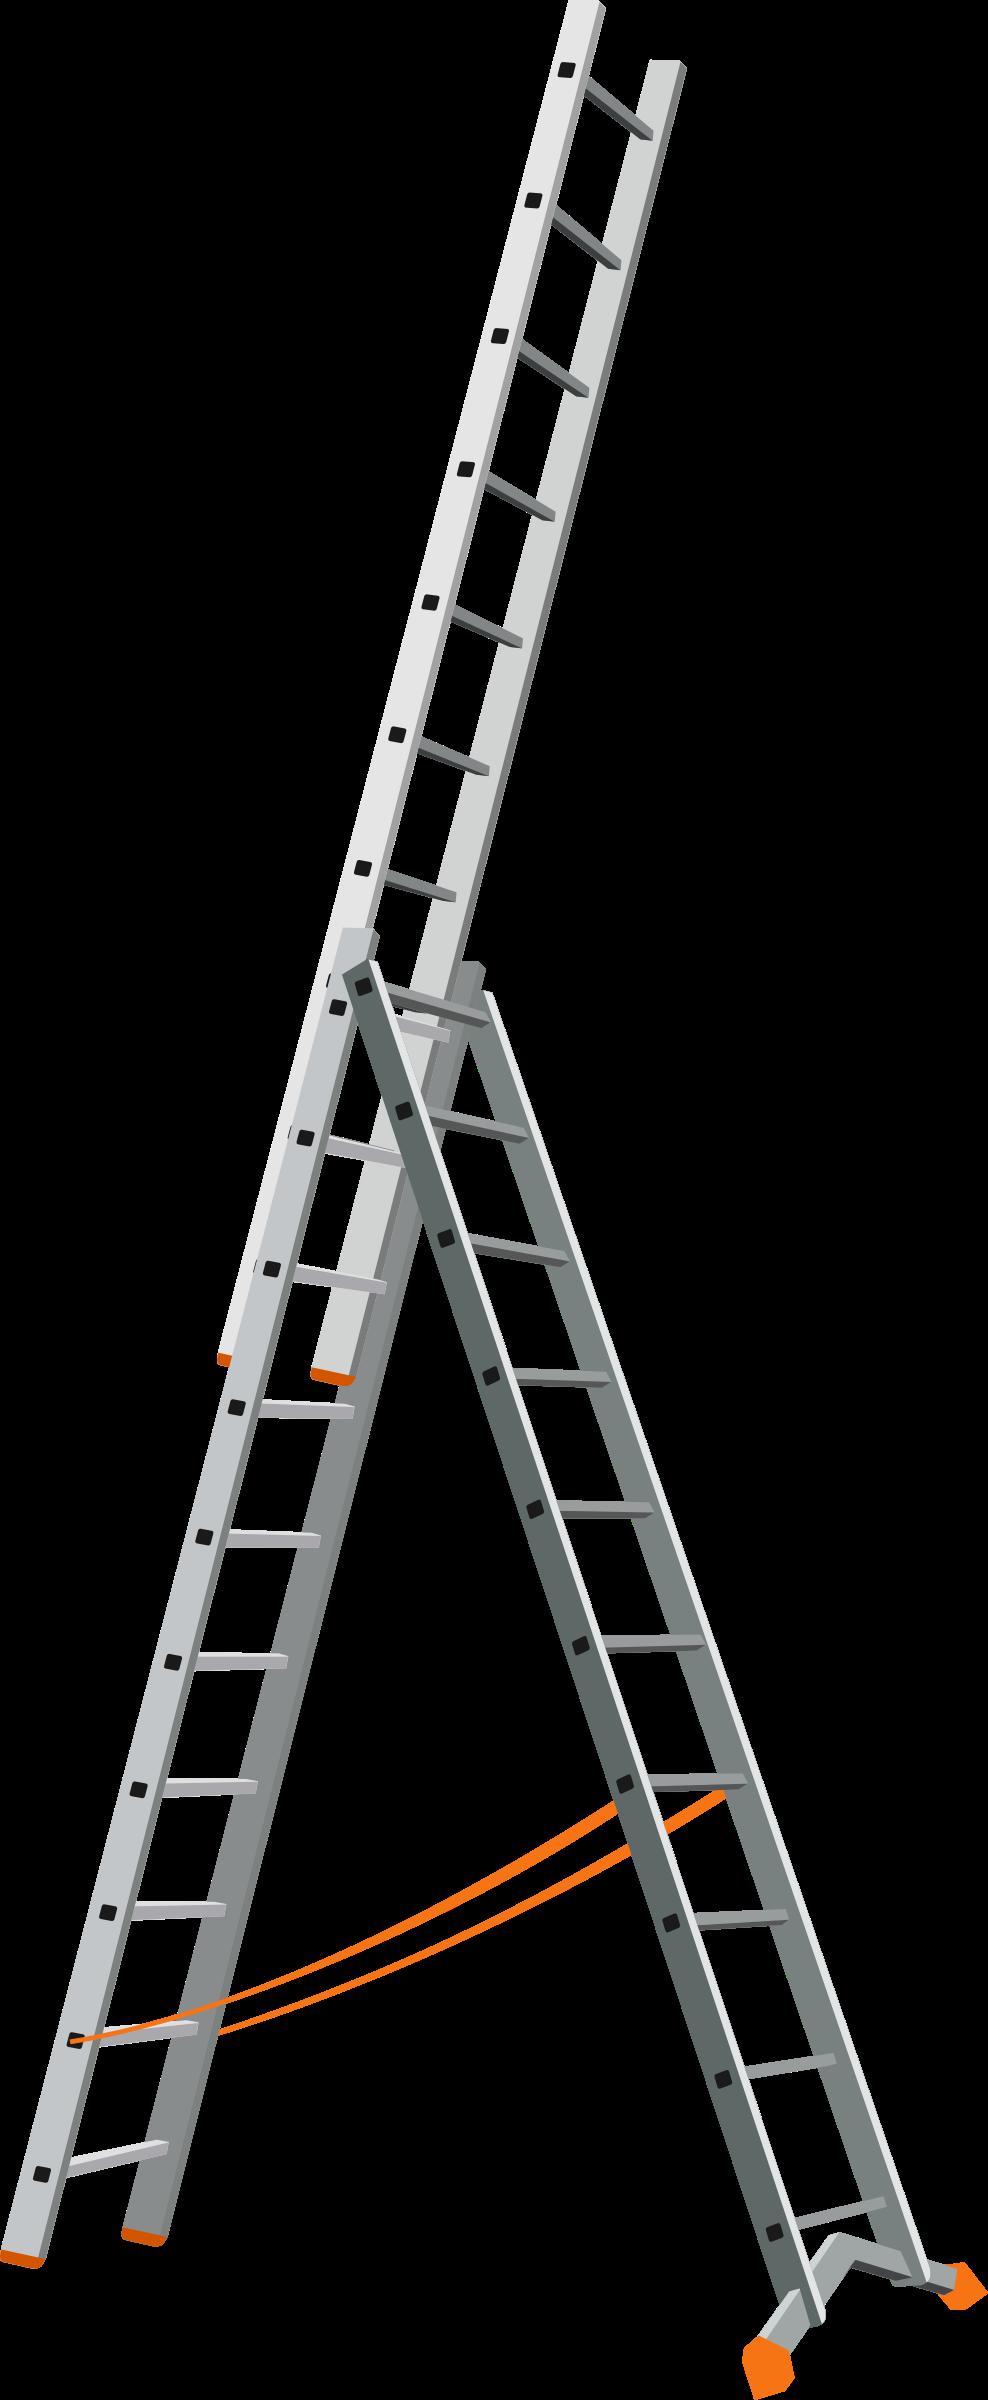 Png x person climbing. Ladder clipart tall ladder